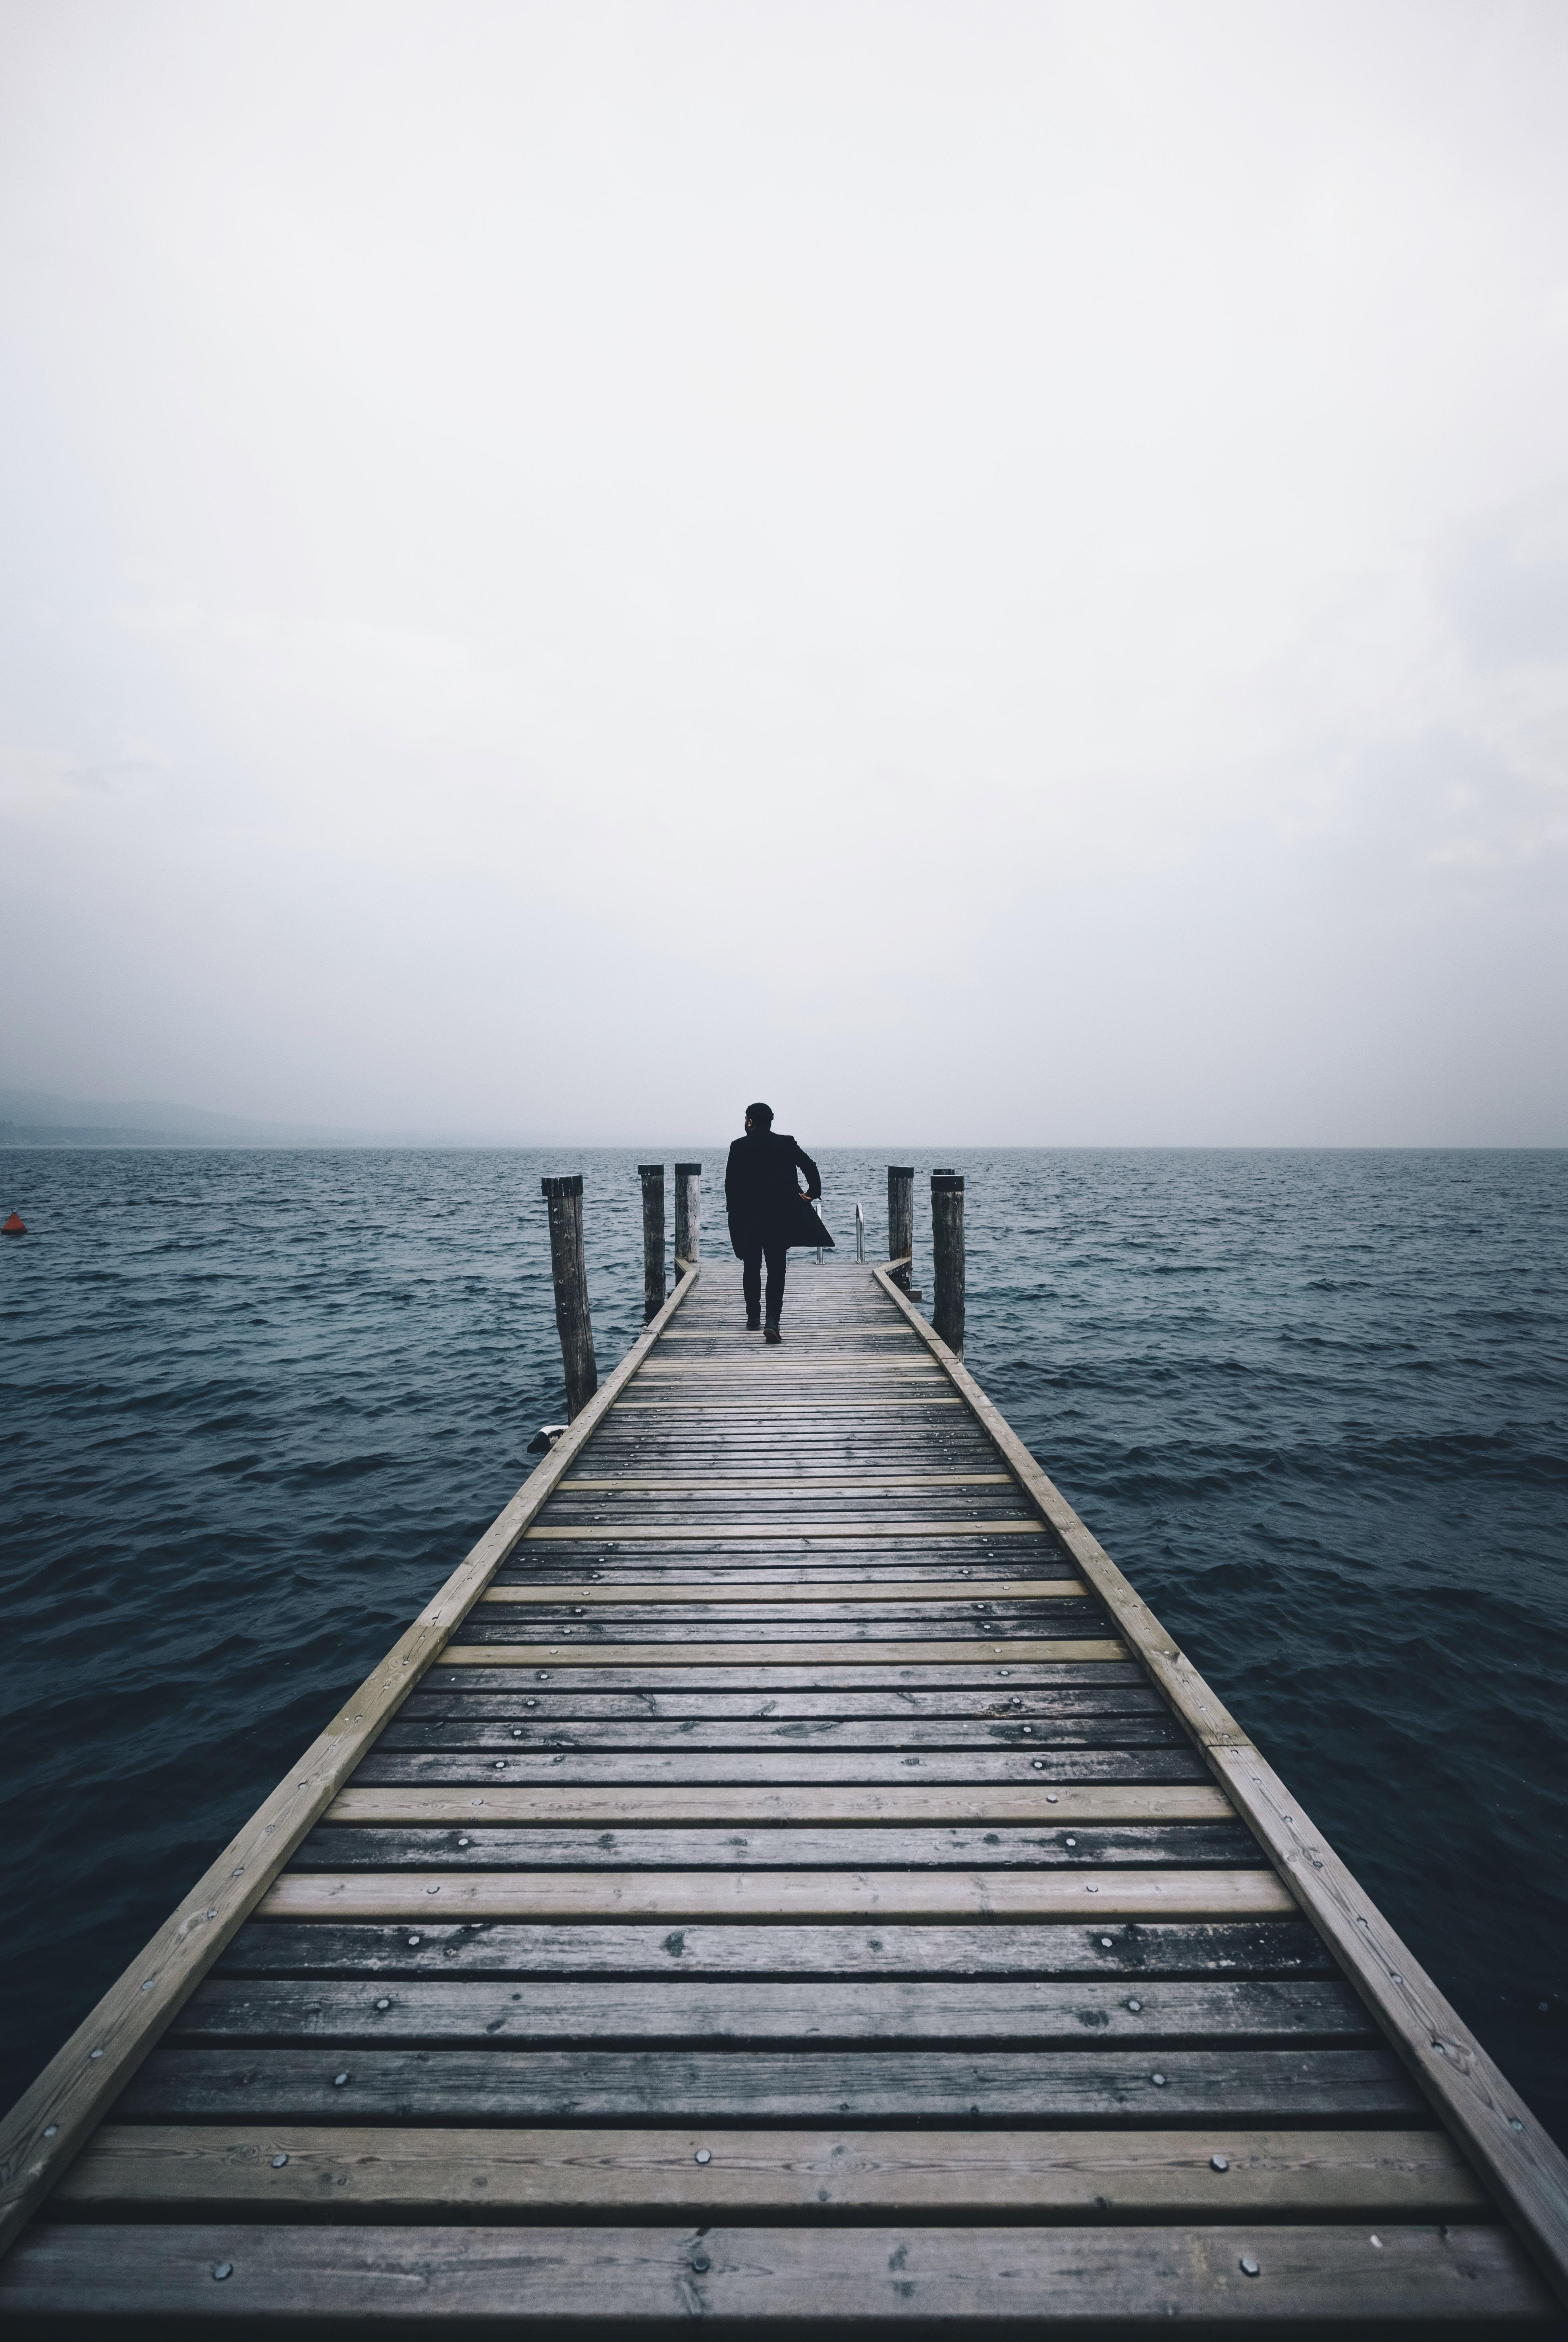 Person walks on pier on a misty morning near the ocean